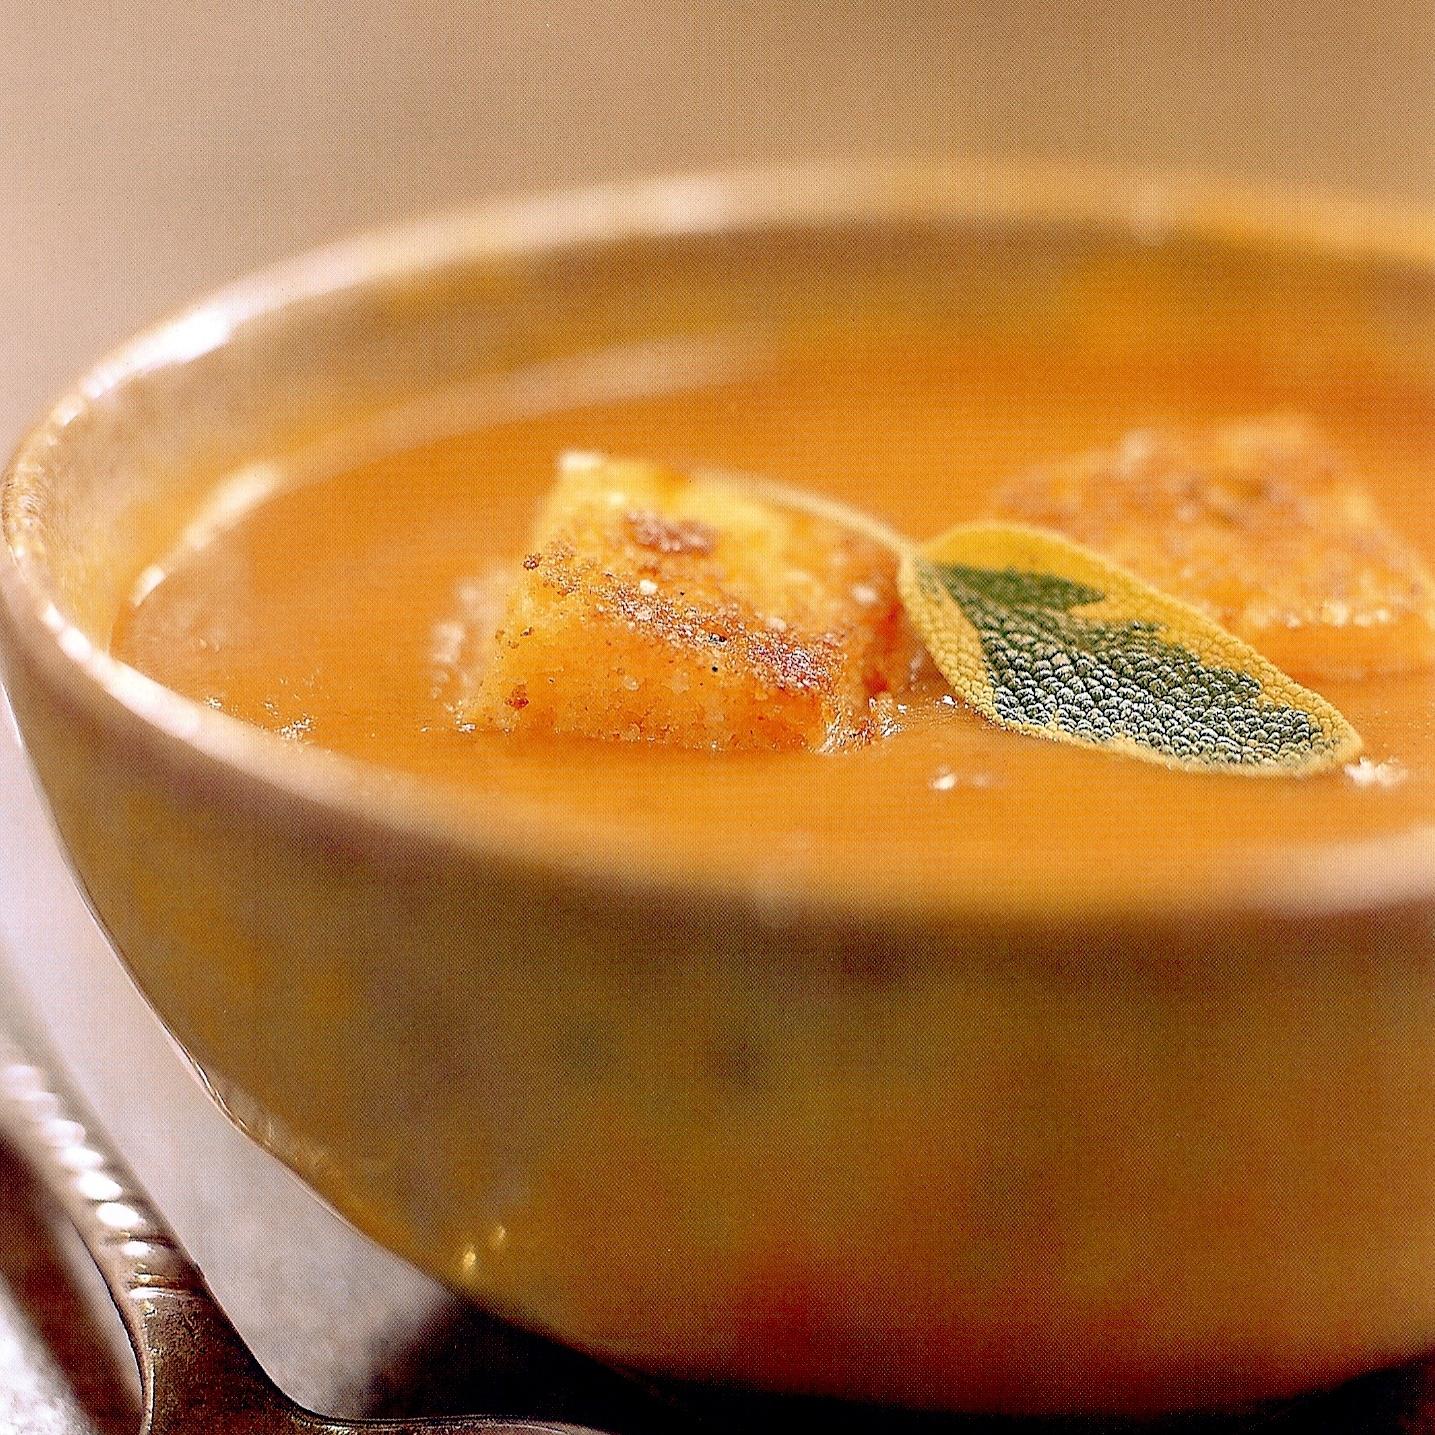 roasted_butternut_squash_soup copy.jpg